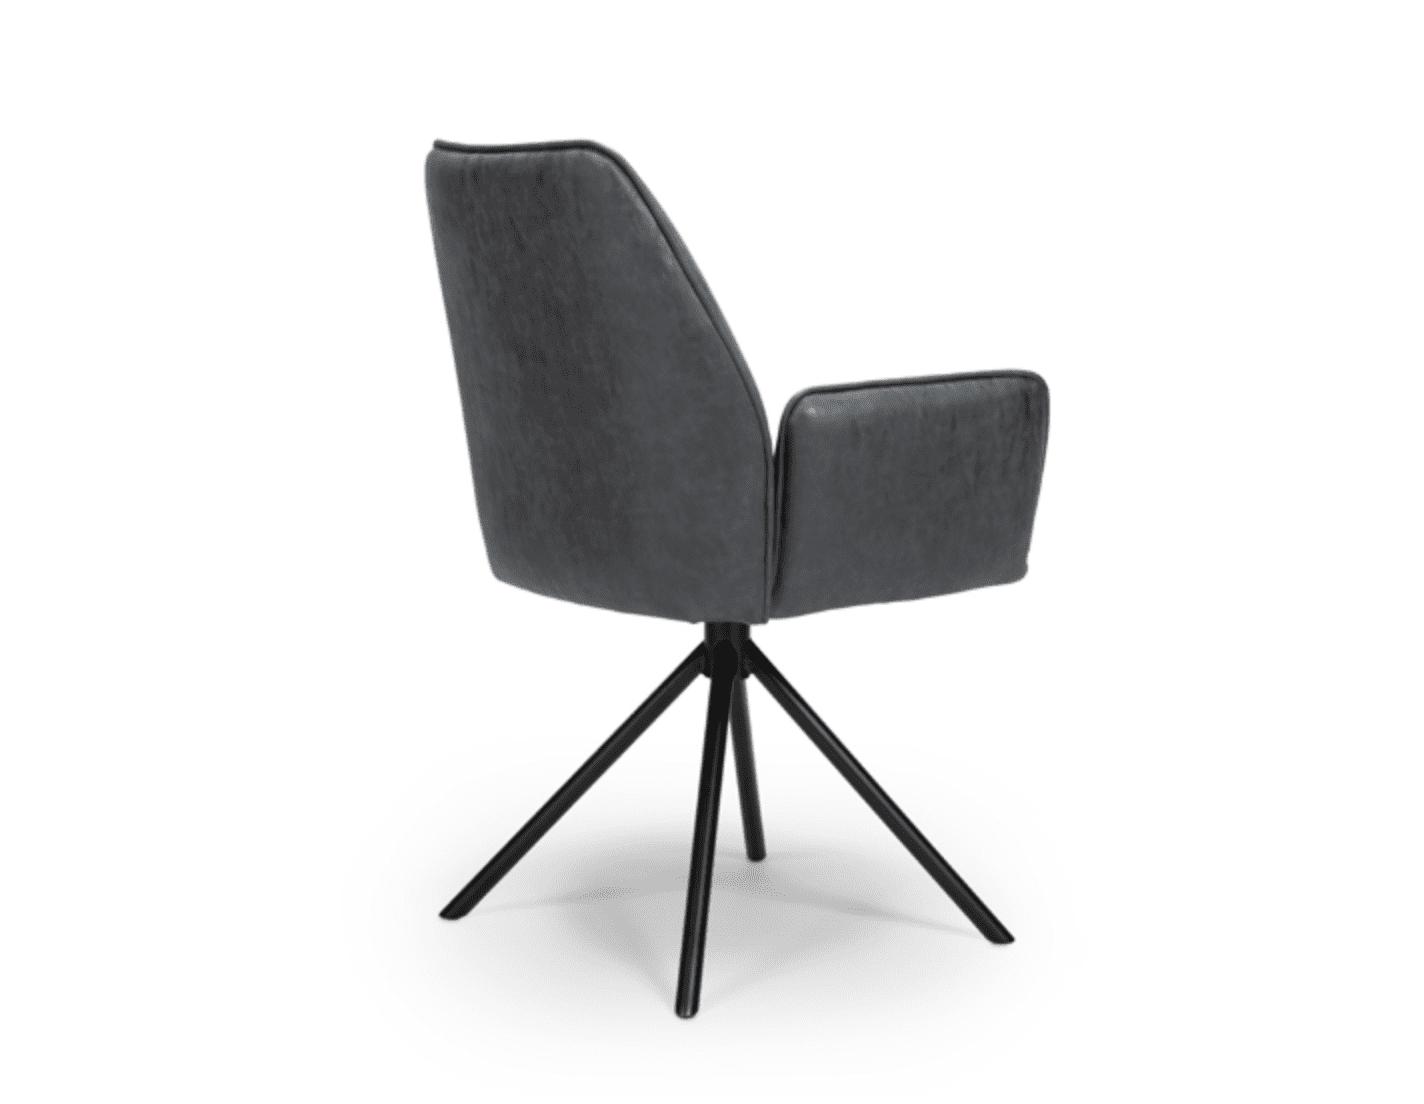 UNO chair wax grey back